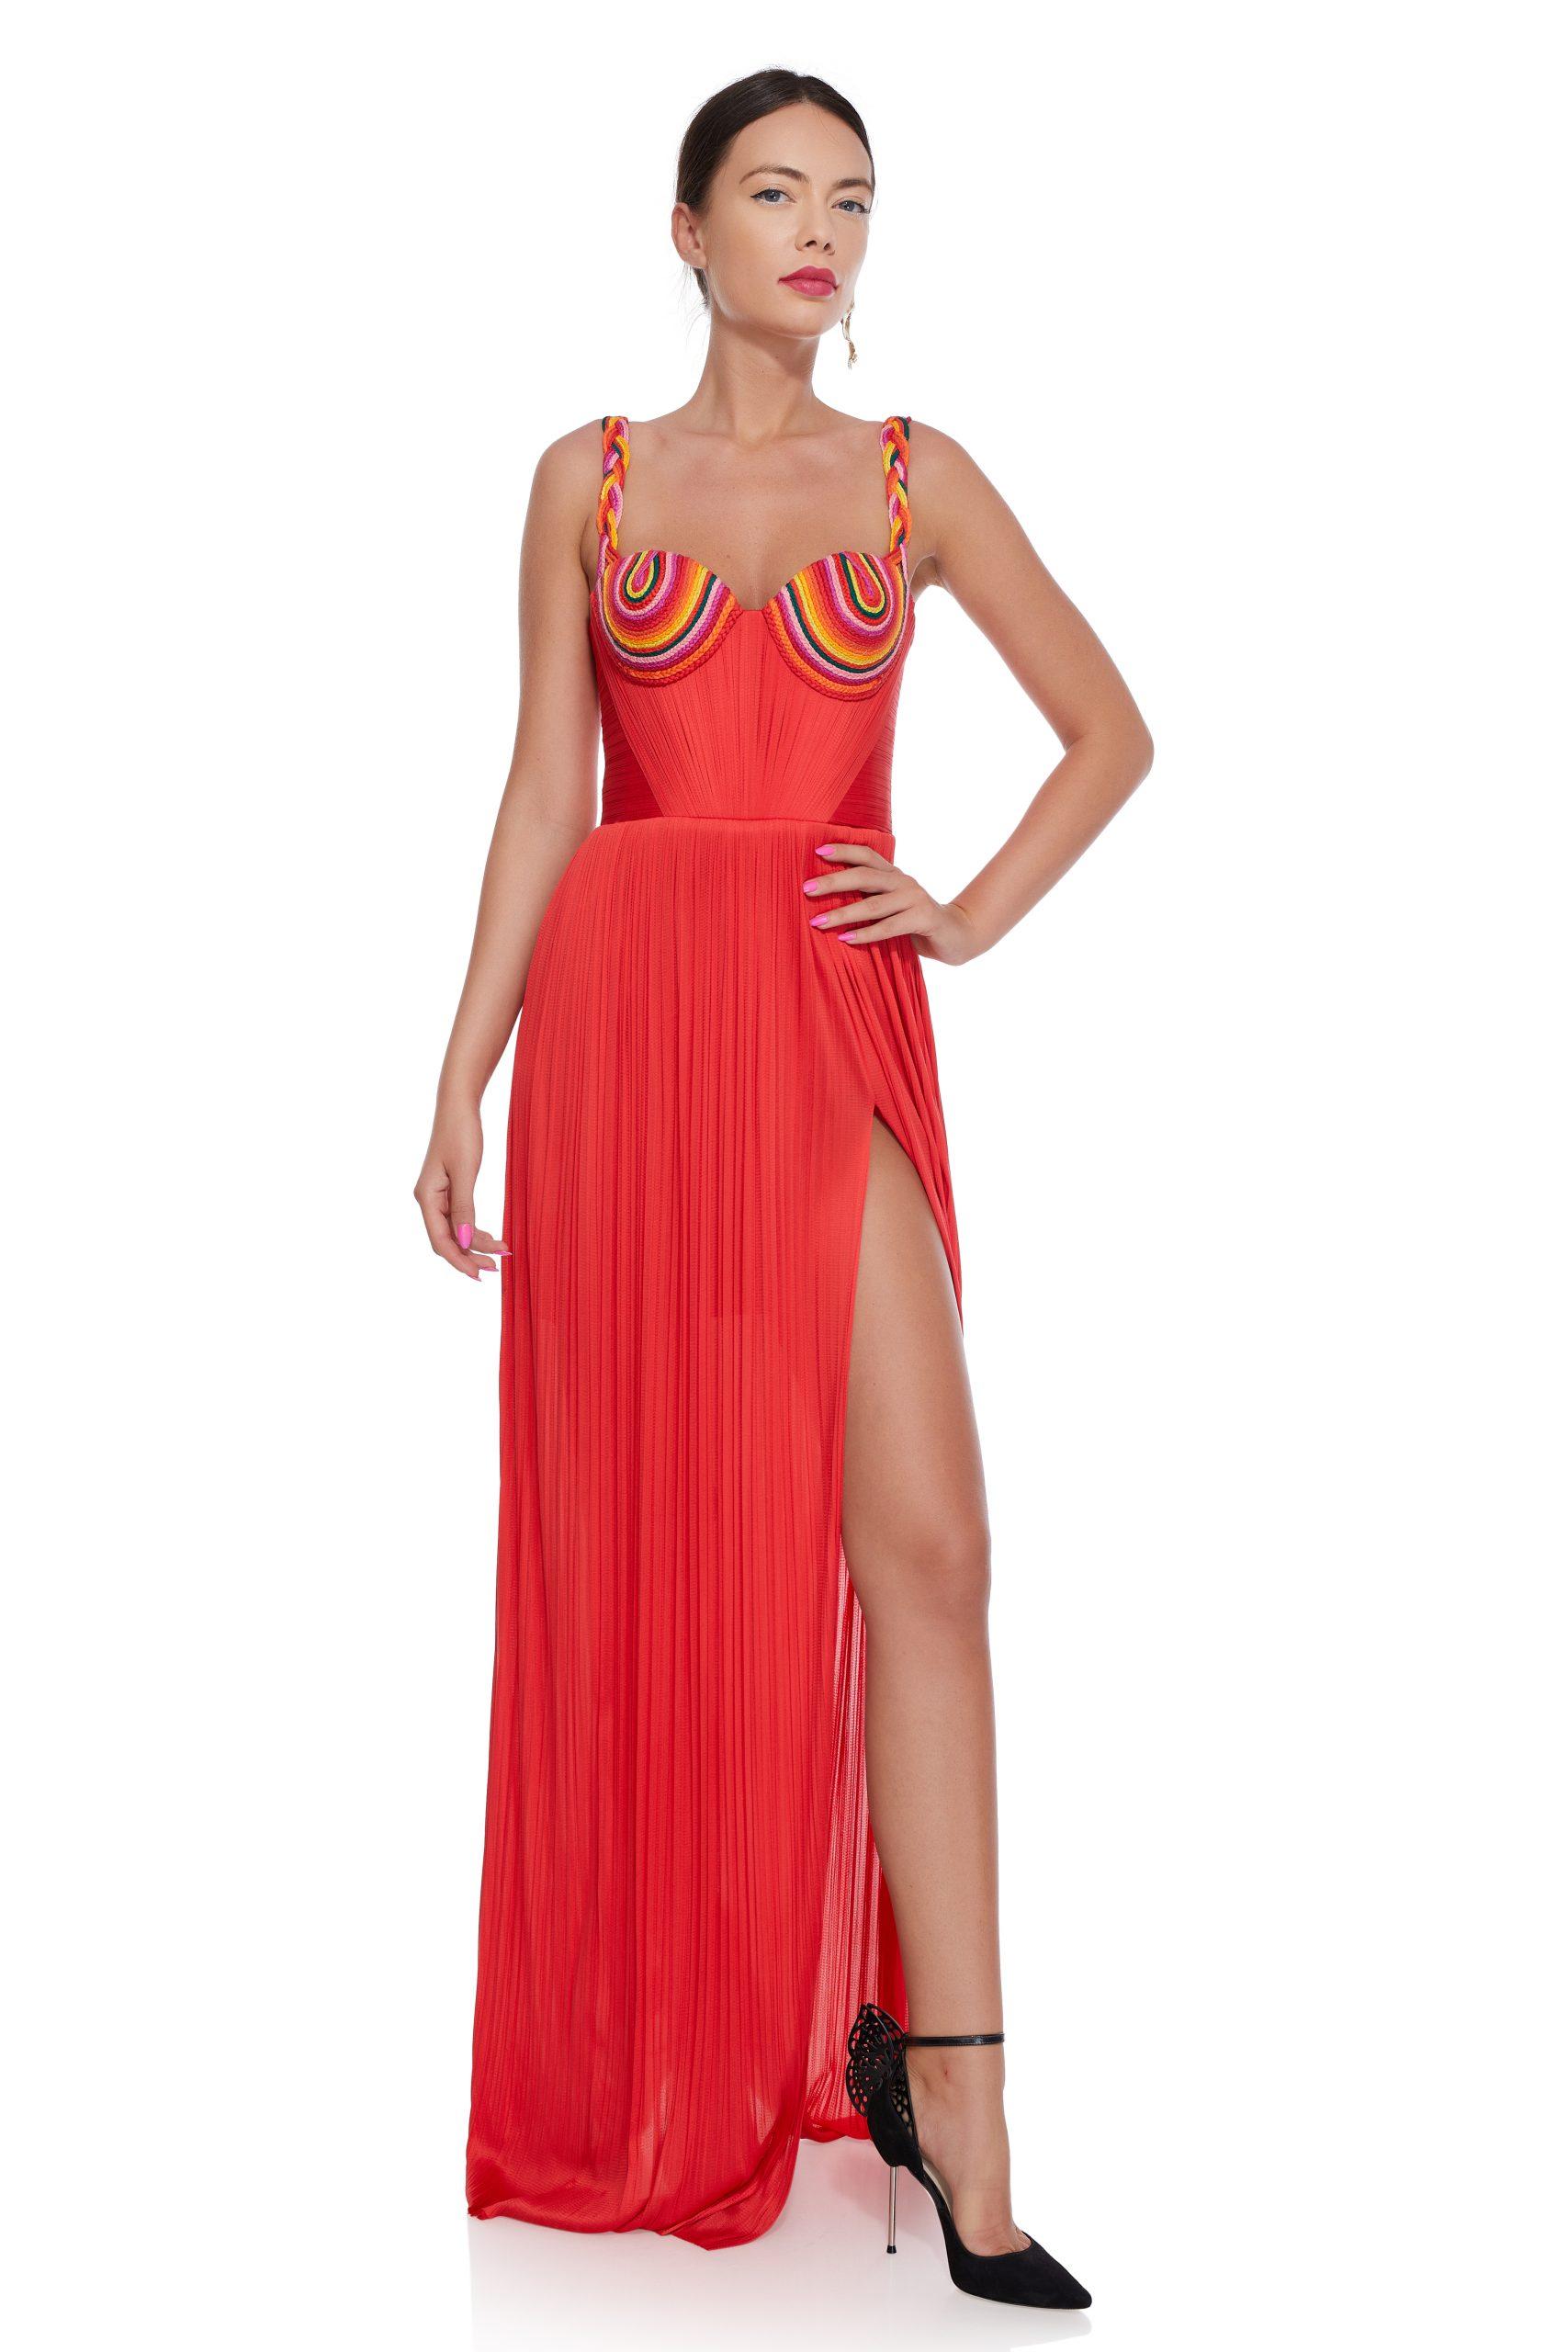 Draped corset evening dress